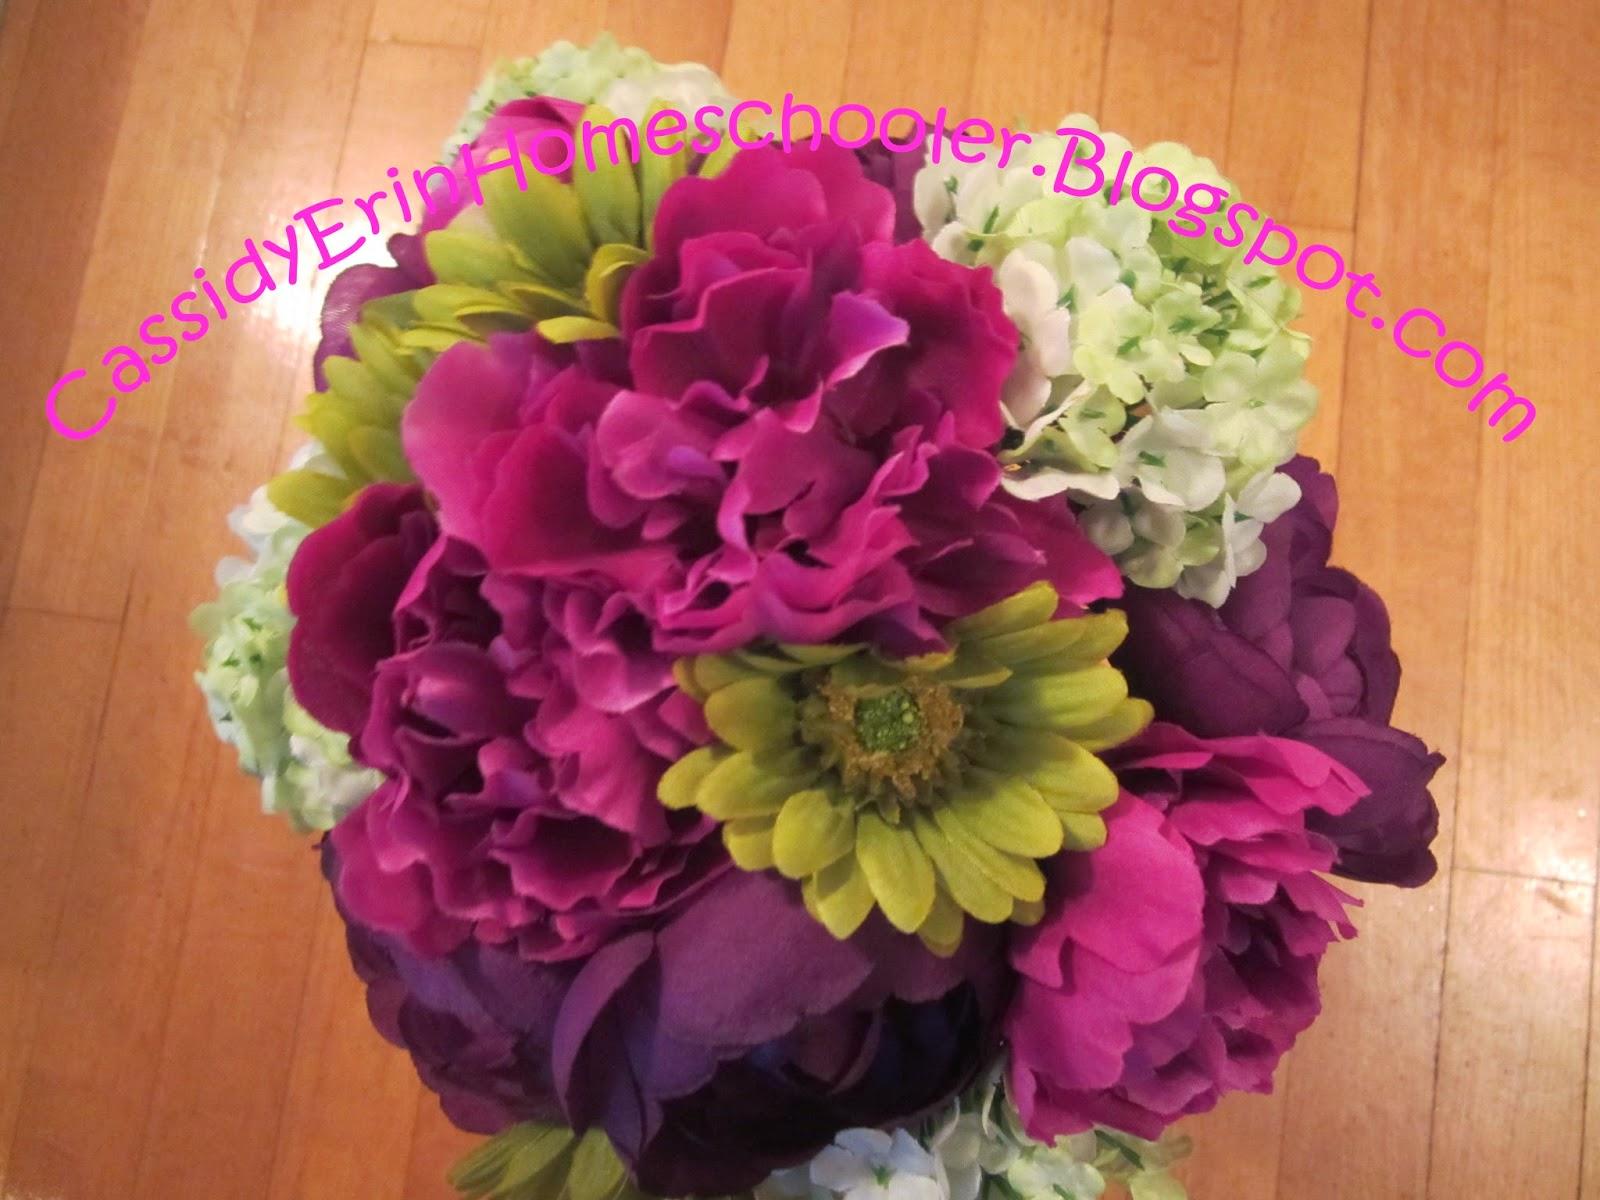 cassidy erin homeschooler artsy picture of the week wonderful, Beautiful flower